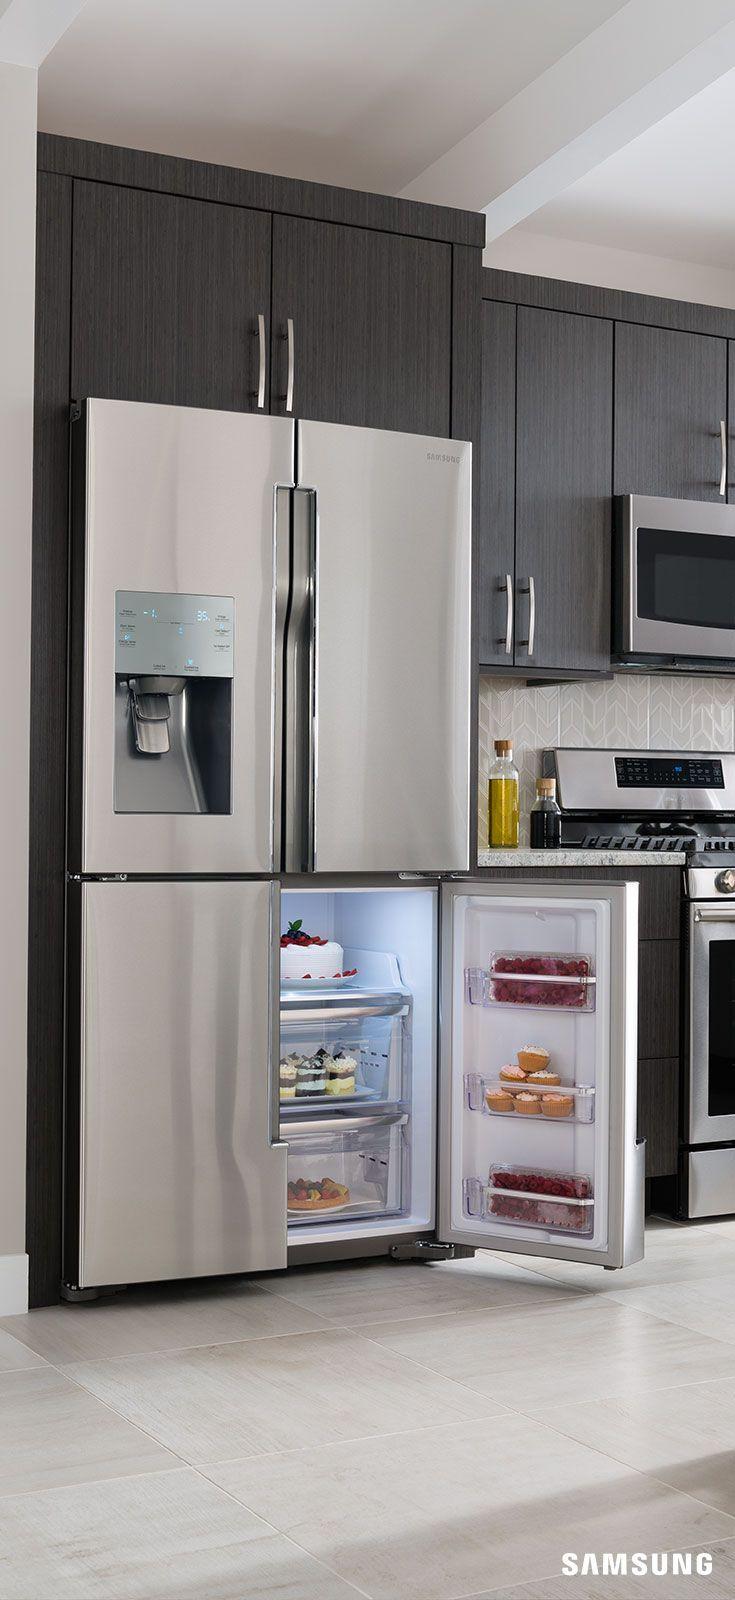 Samsung RF23J9011SR 23u0027 Counter Depth 4 Door Flex Refrigerator. Has A  Convertible